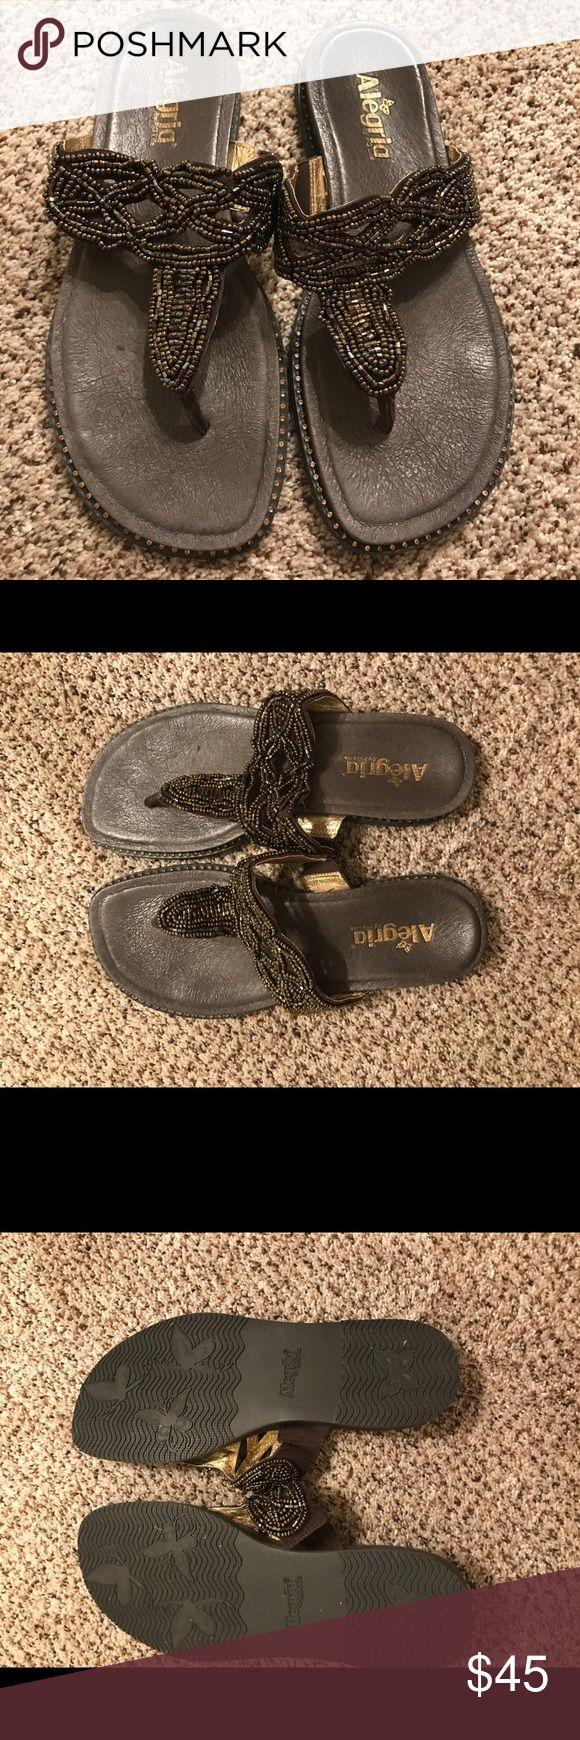 Alegria Sandal Size 40 Alegria Sandal Size 40 in great condition. Alegria Shoes Sandals